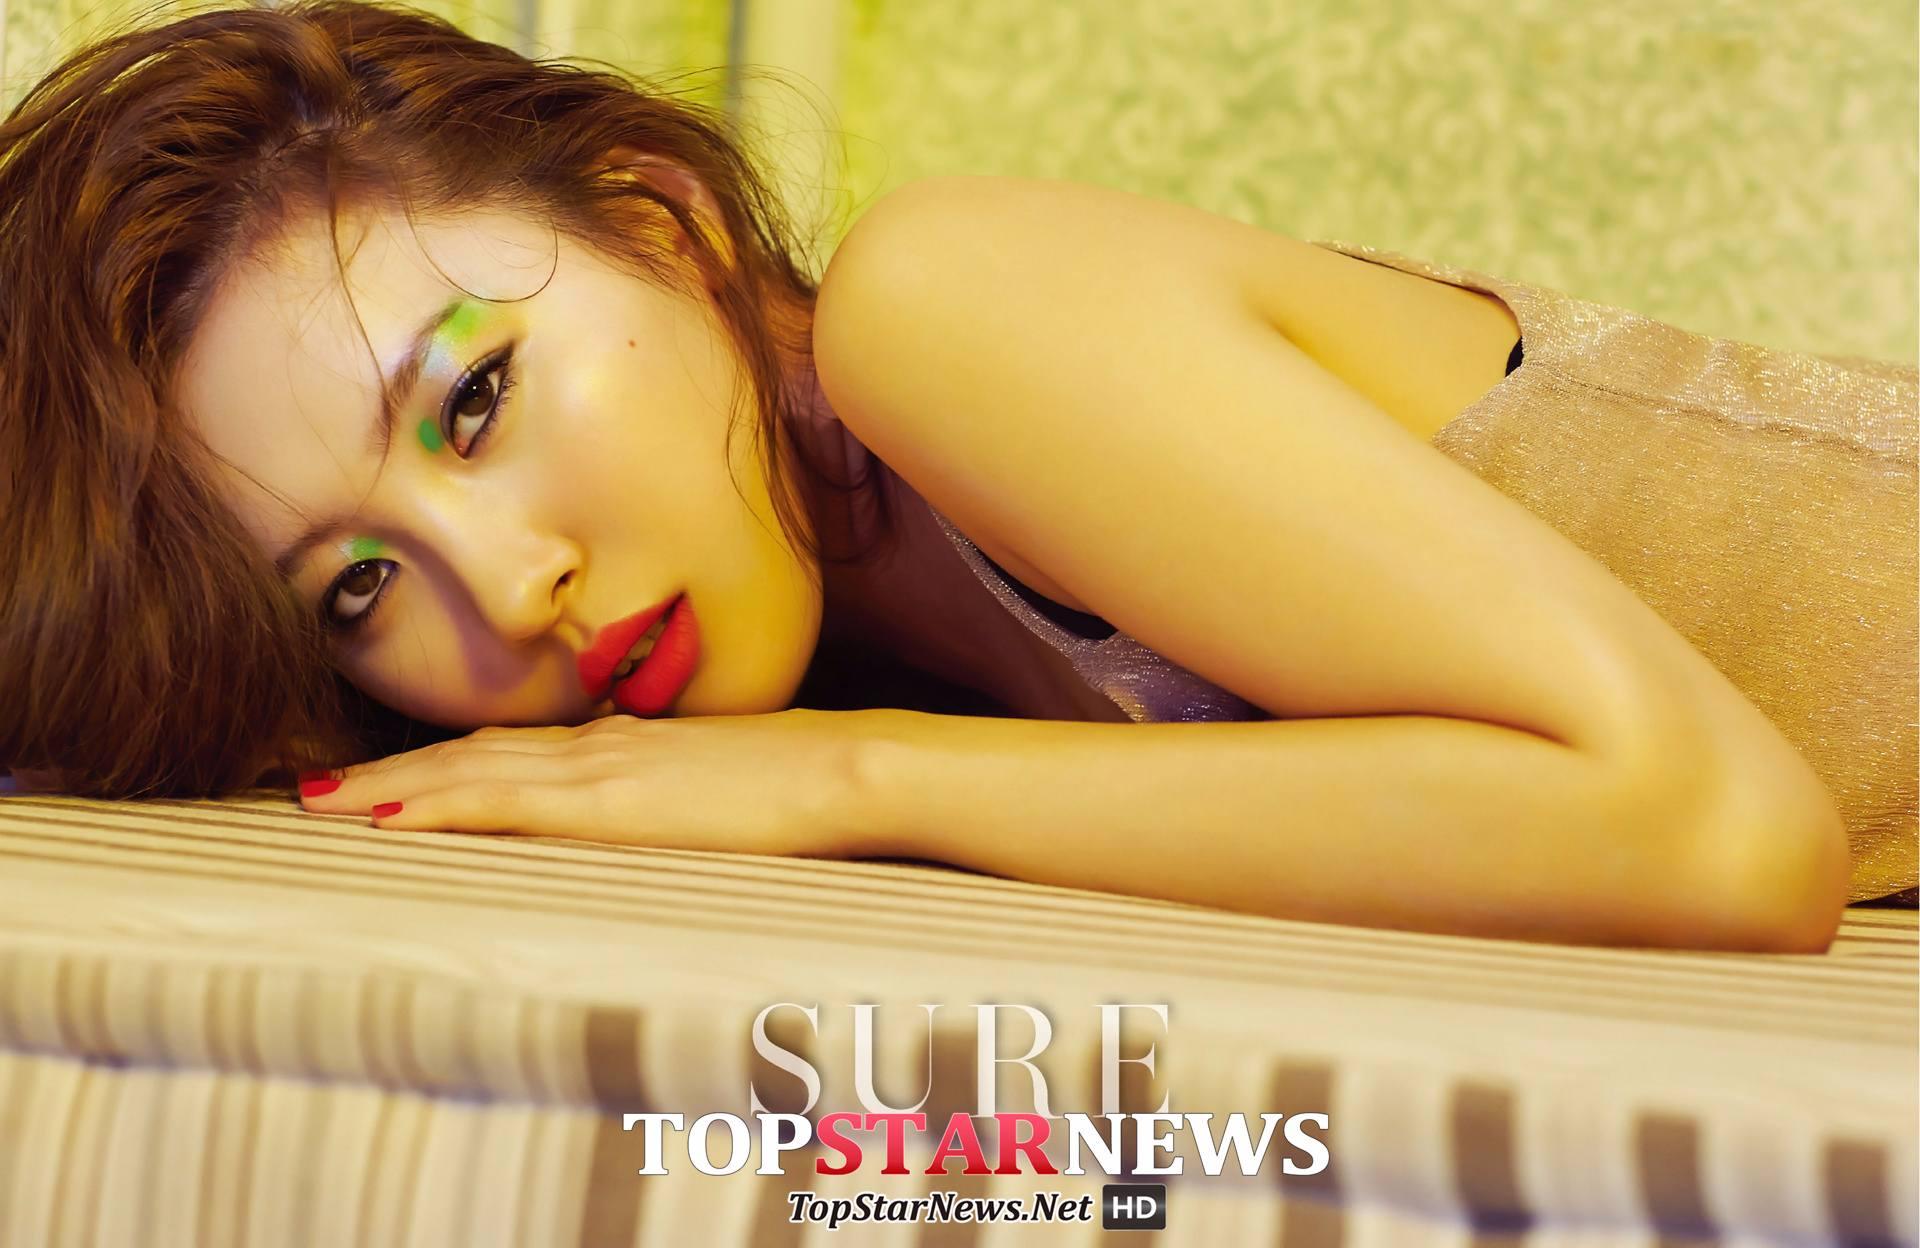 Wonder Girls的宣美也以「夏日晚上的夏天look」為主題,穿過睡衣穿搭登上雜誌唷~